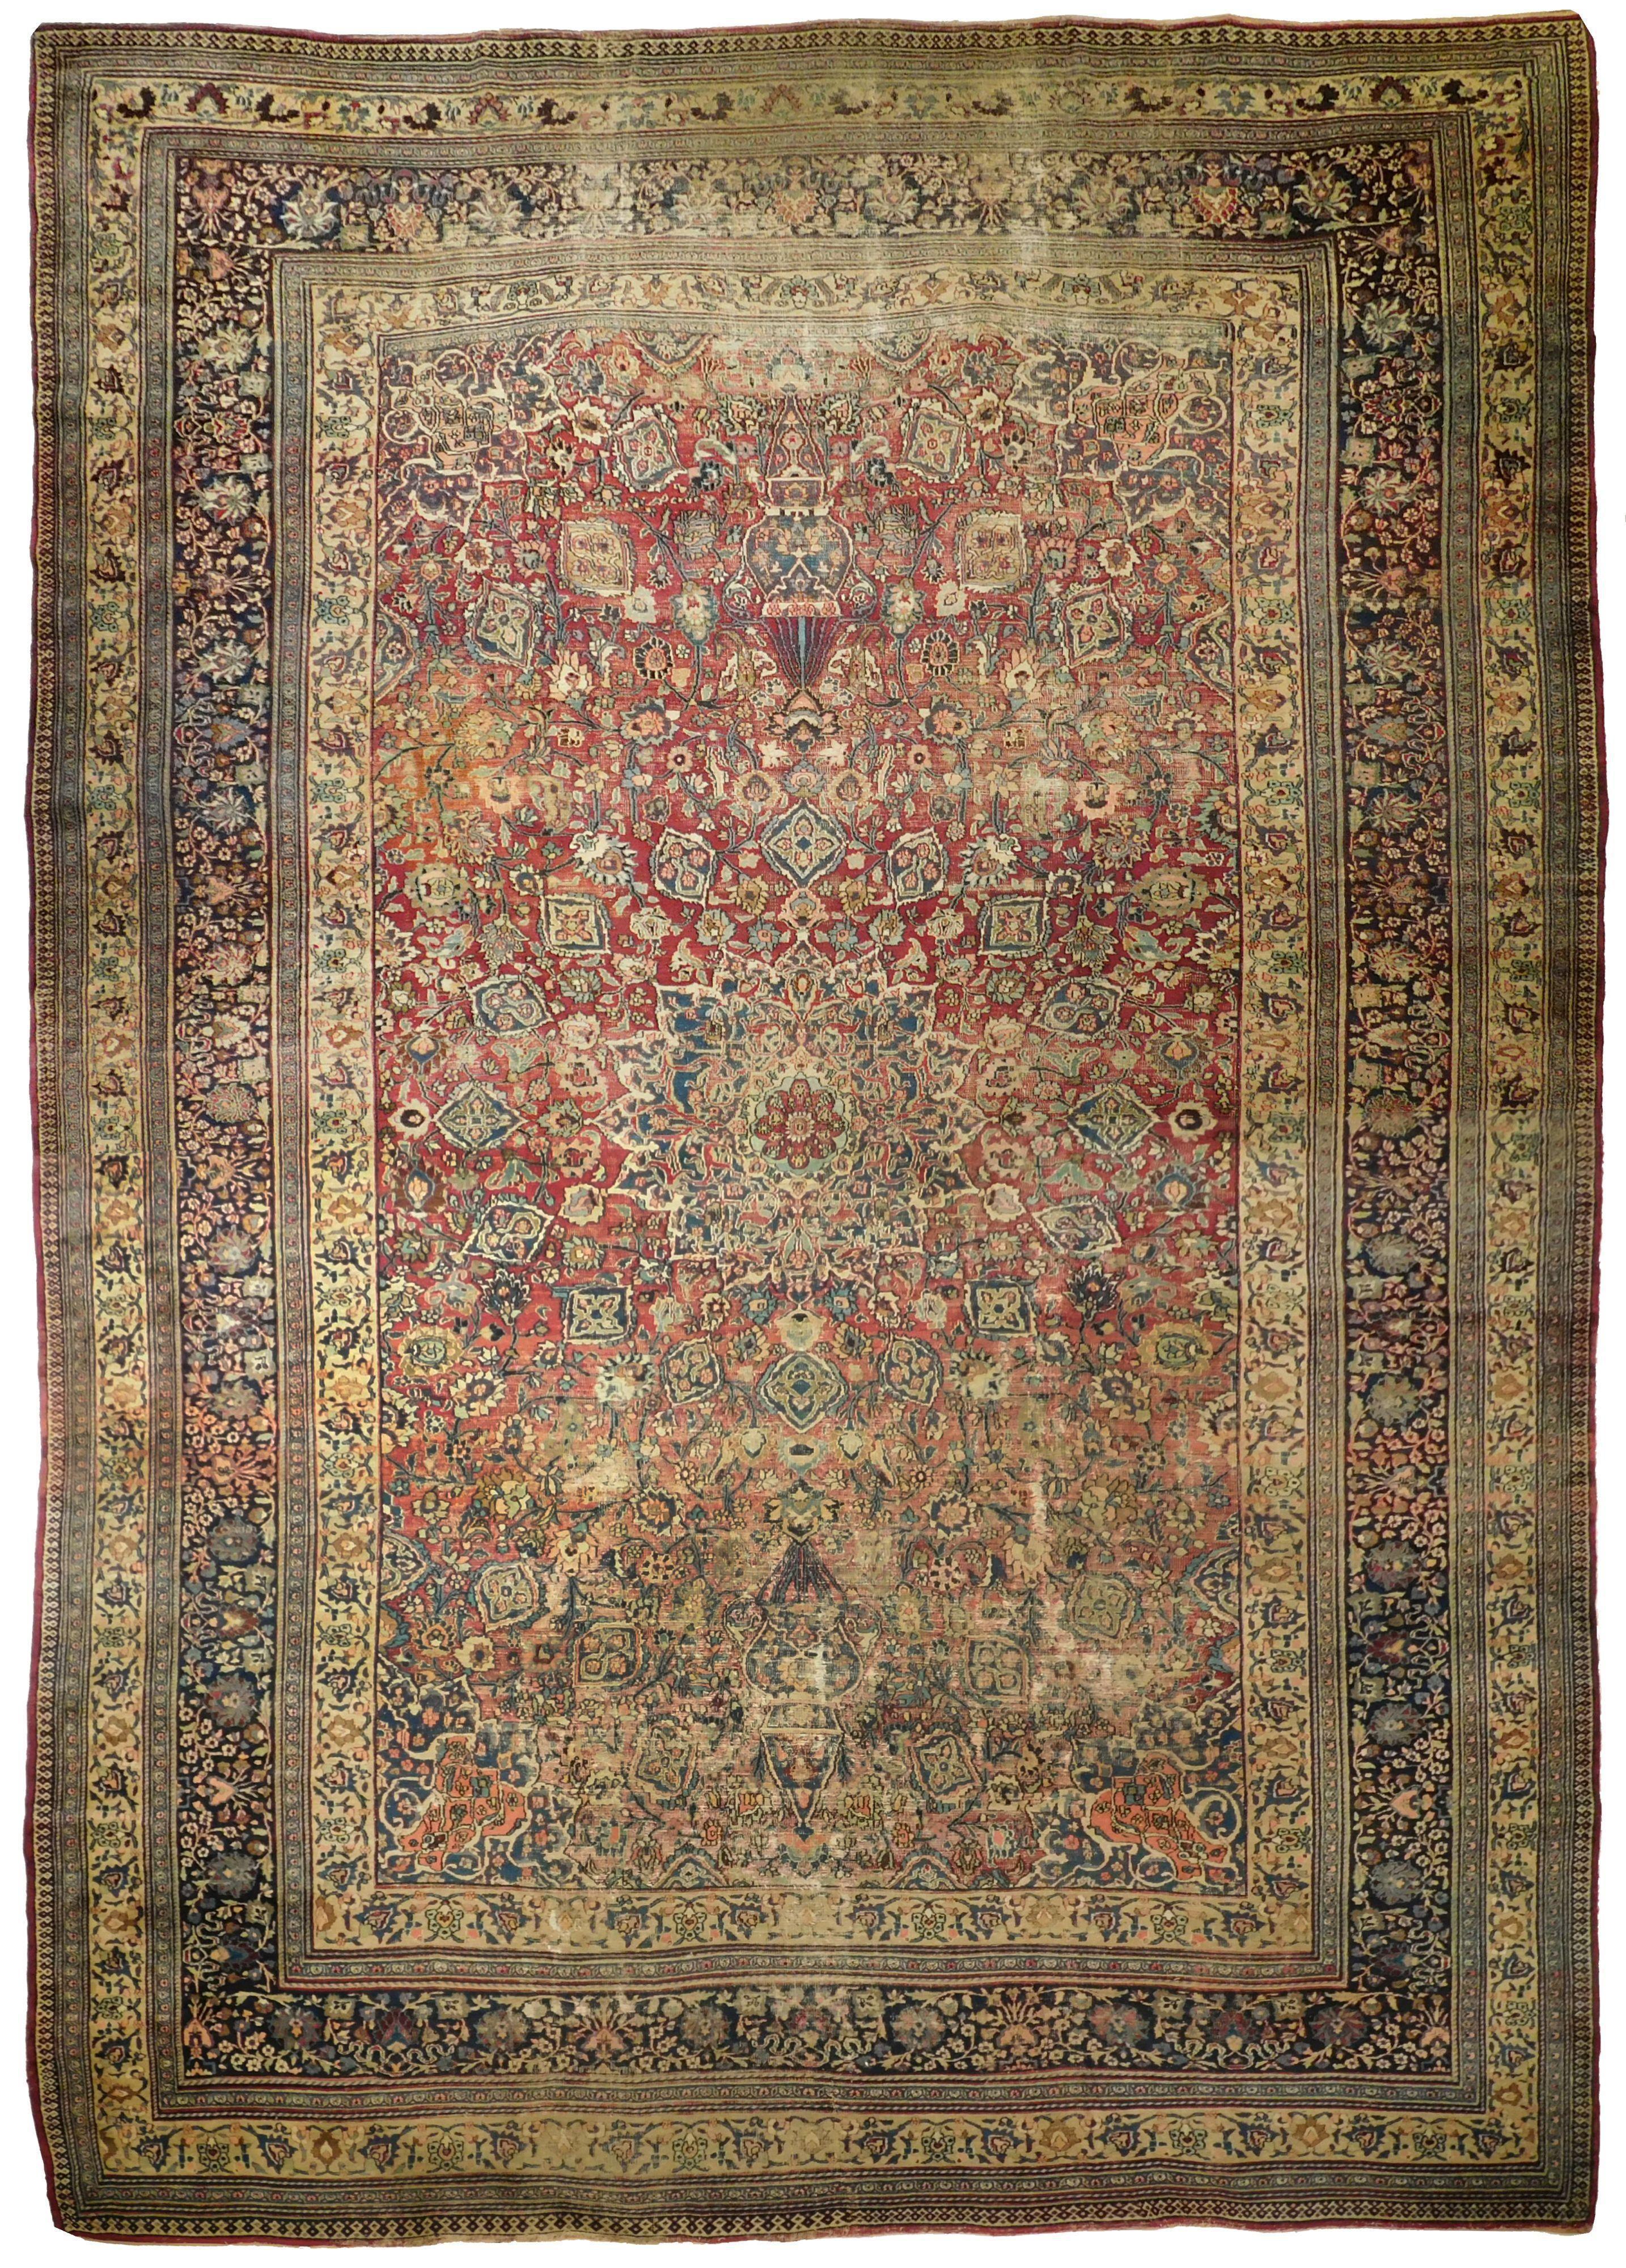 Distressed Antique Persian Mashad Rug 11 0 X 17 0 In 2020 Persian Rug Designs Persian Carpet Antique Persian Carpet